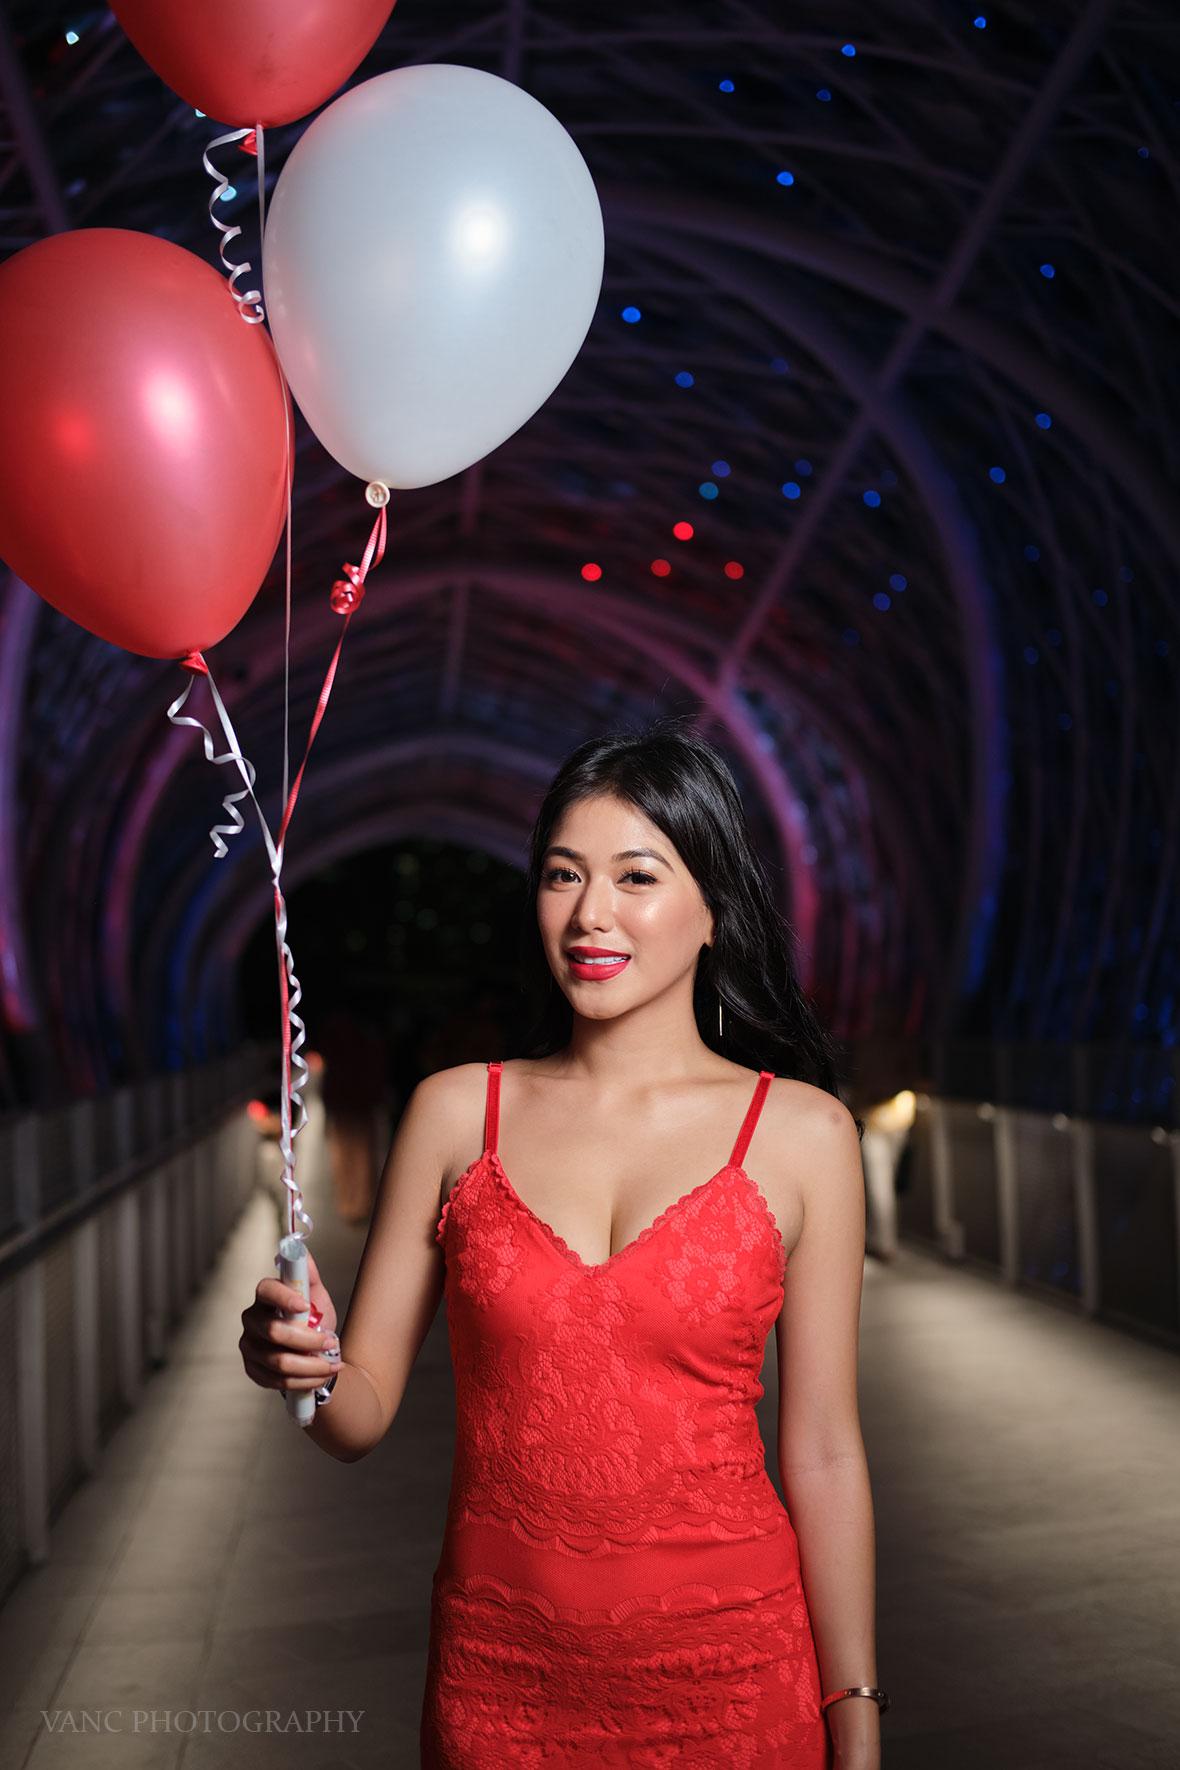 night portrait girl in red dress